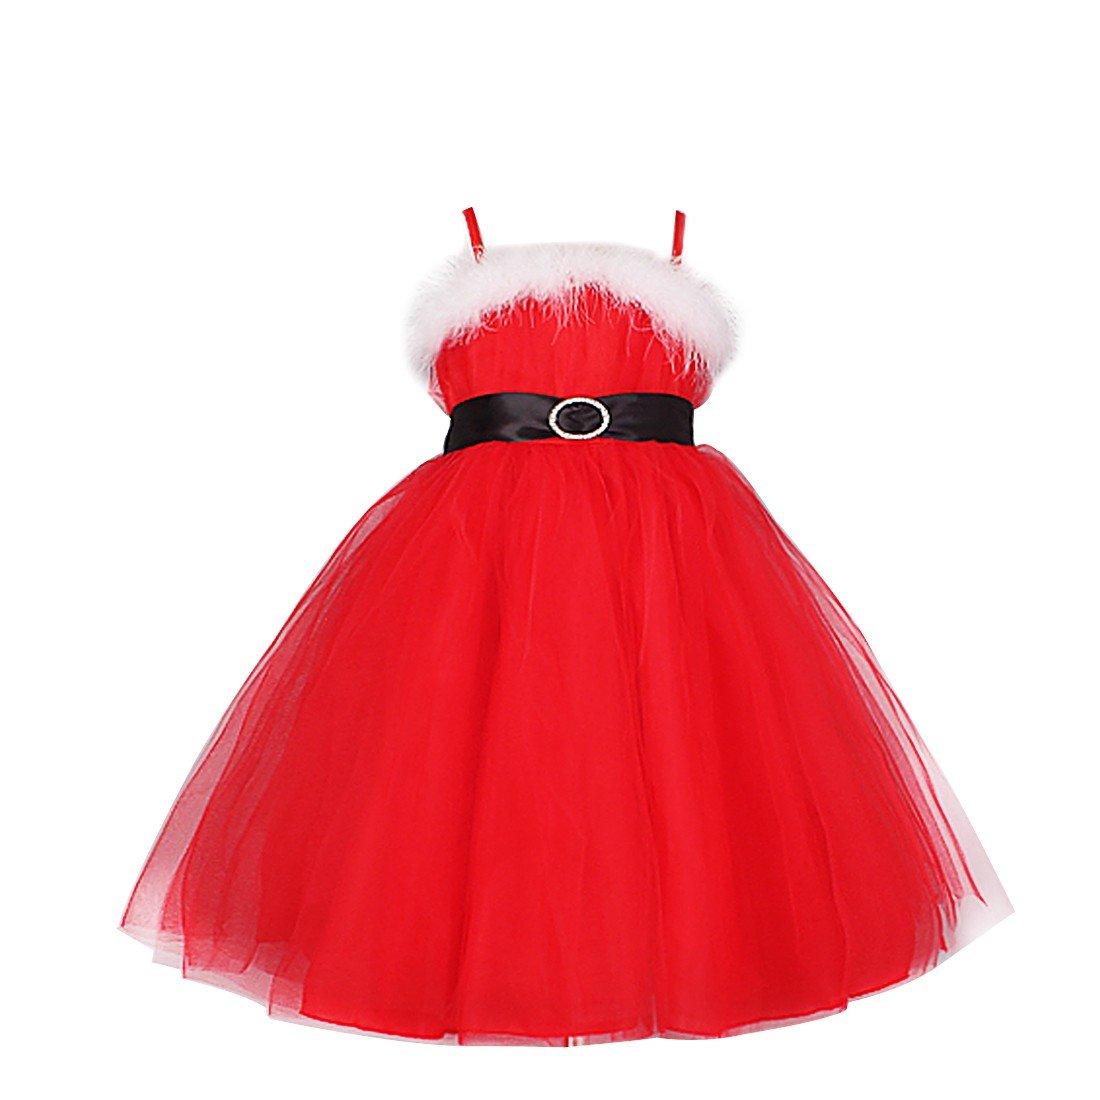 YiZYiF Baby Girl's Christmas Sash Bow Spaghetti Straps Party Dress Up